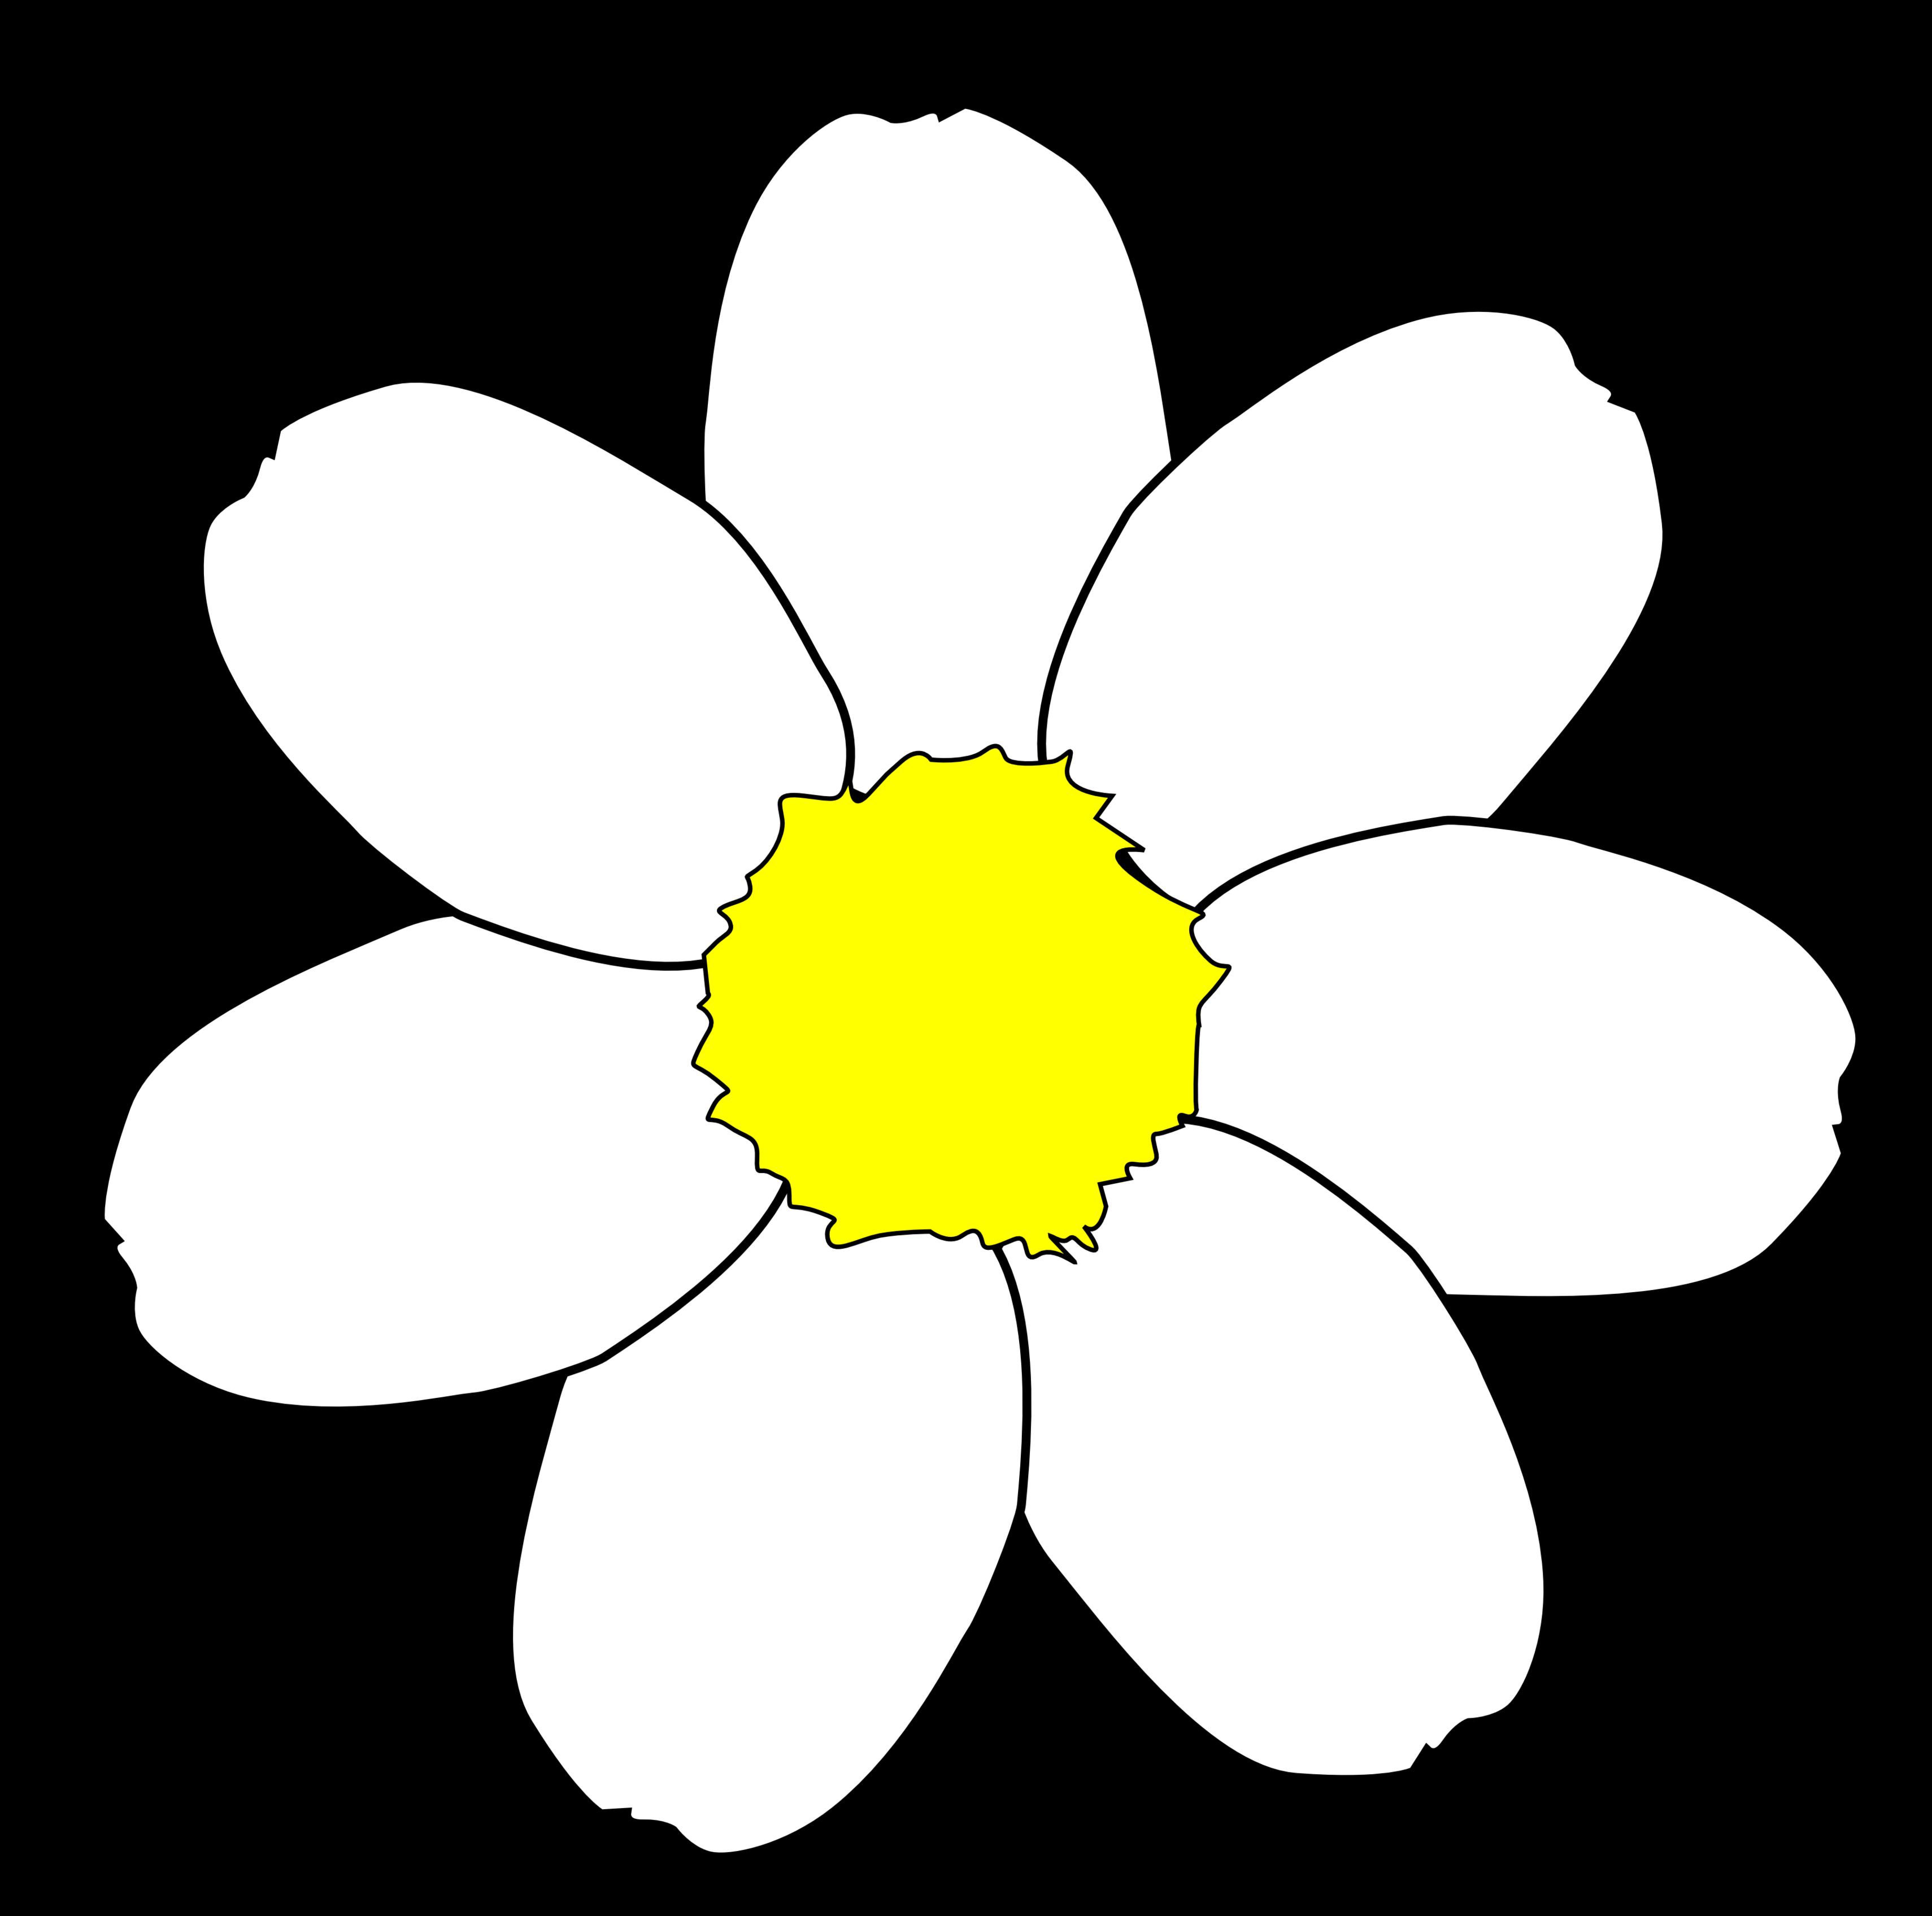 Spanish flower clipart svg freeuse download Flower Petal Clipart (61+) svg freeuse download